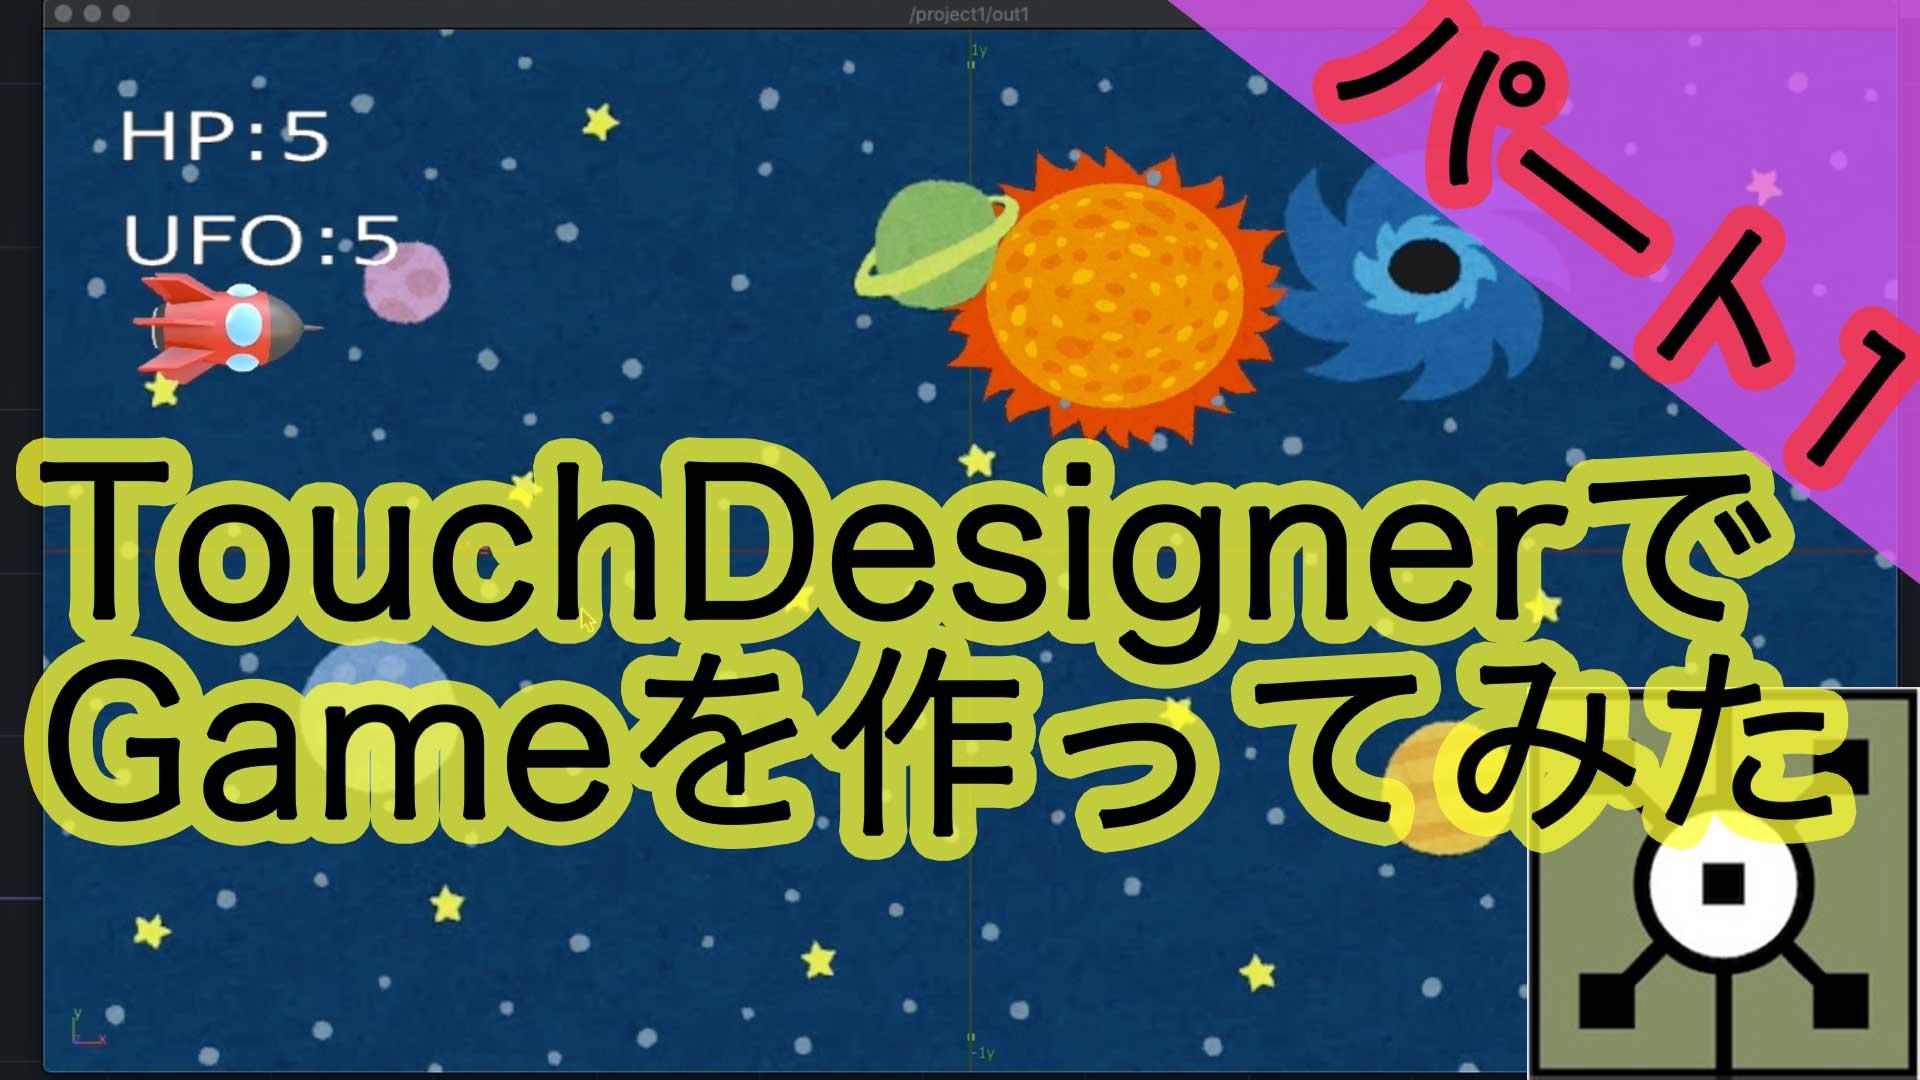 TouchDesigner チュートリアル